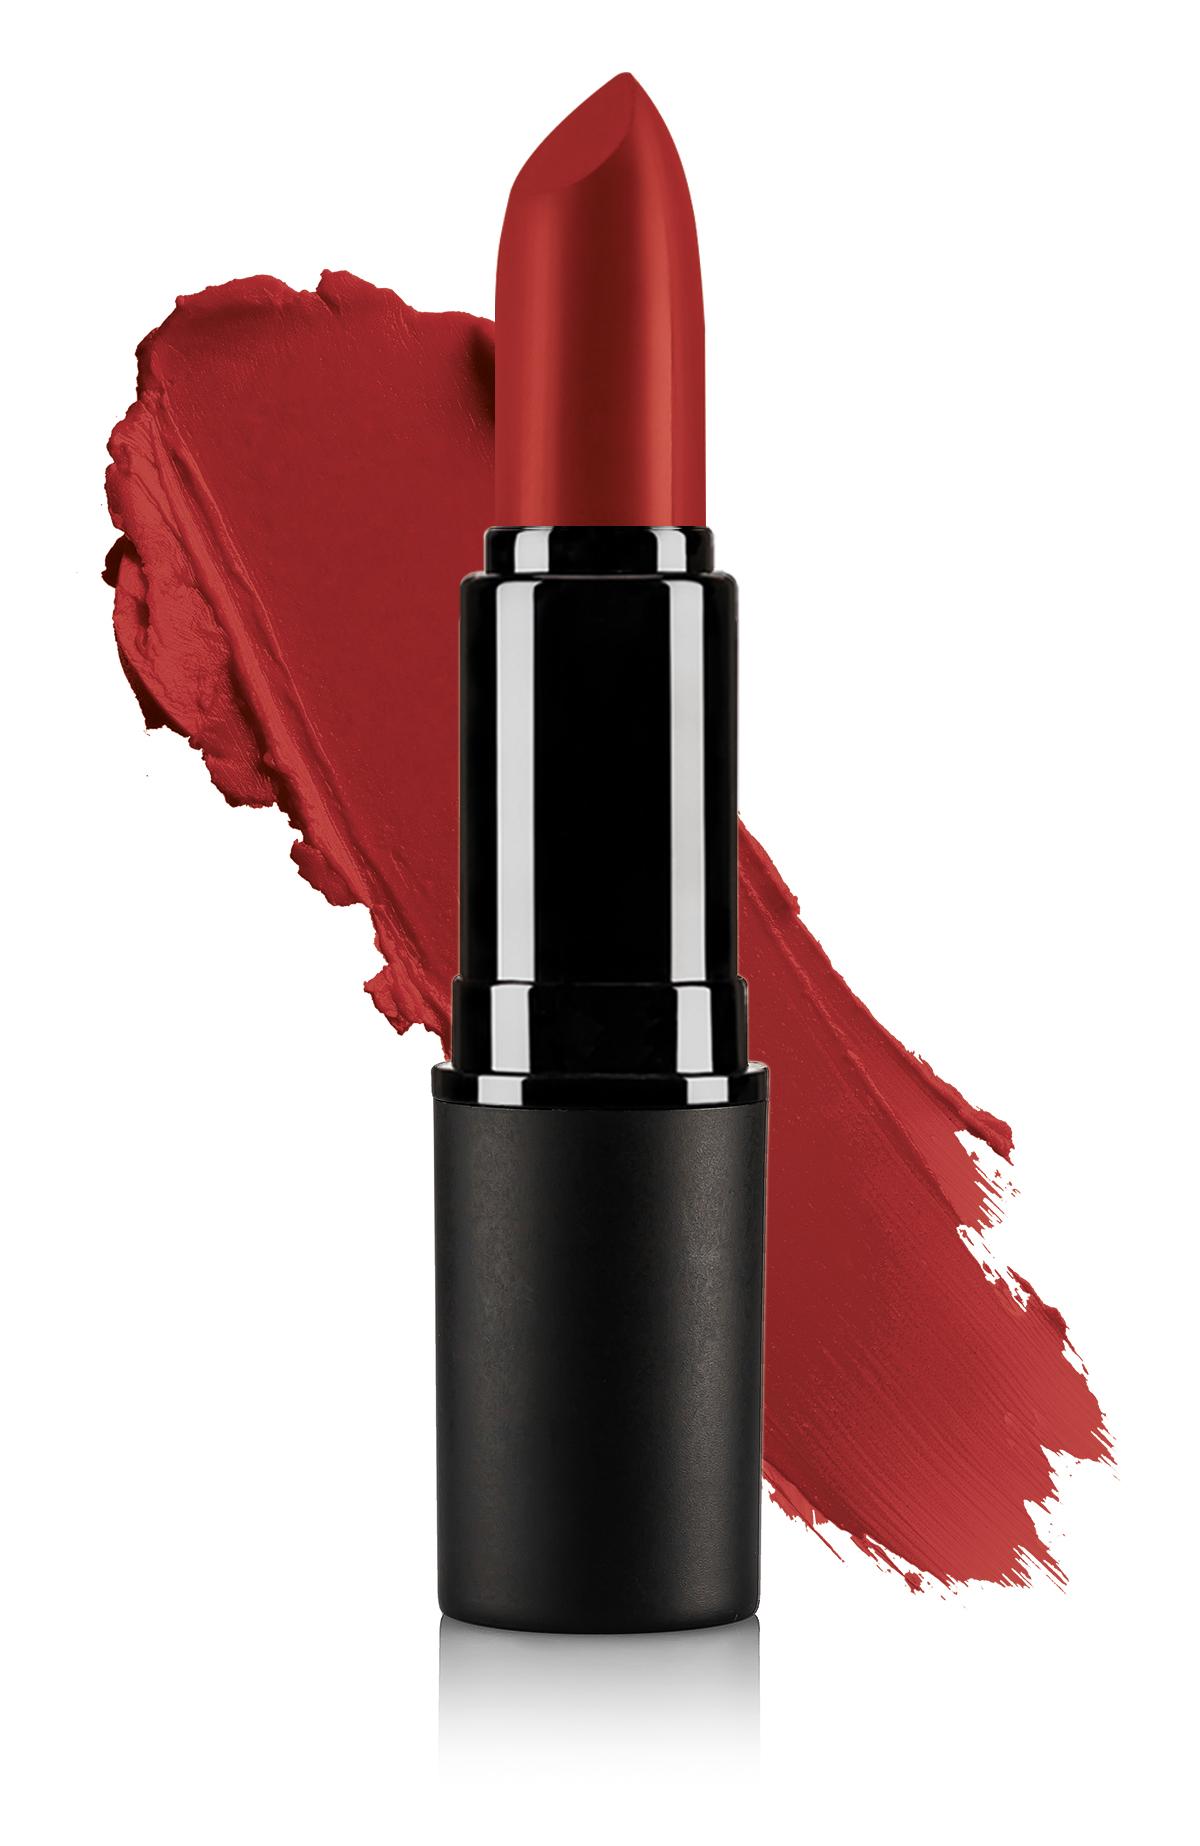 Matte Lipstick - 178 -Ruj - Lipstick Thumbnail